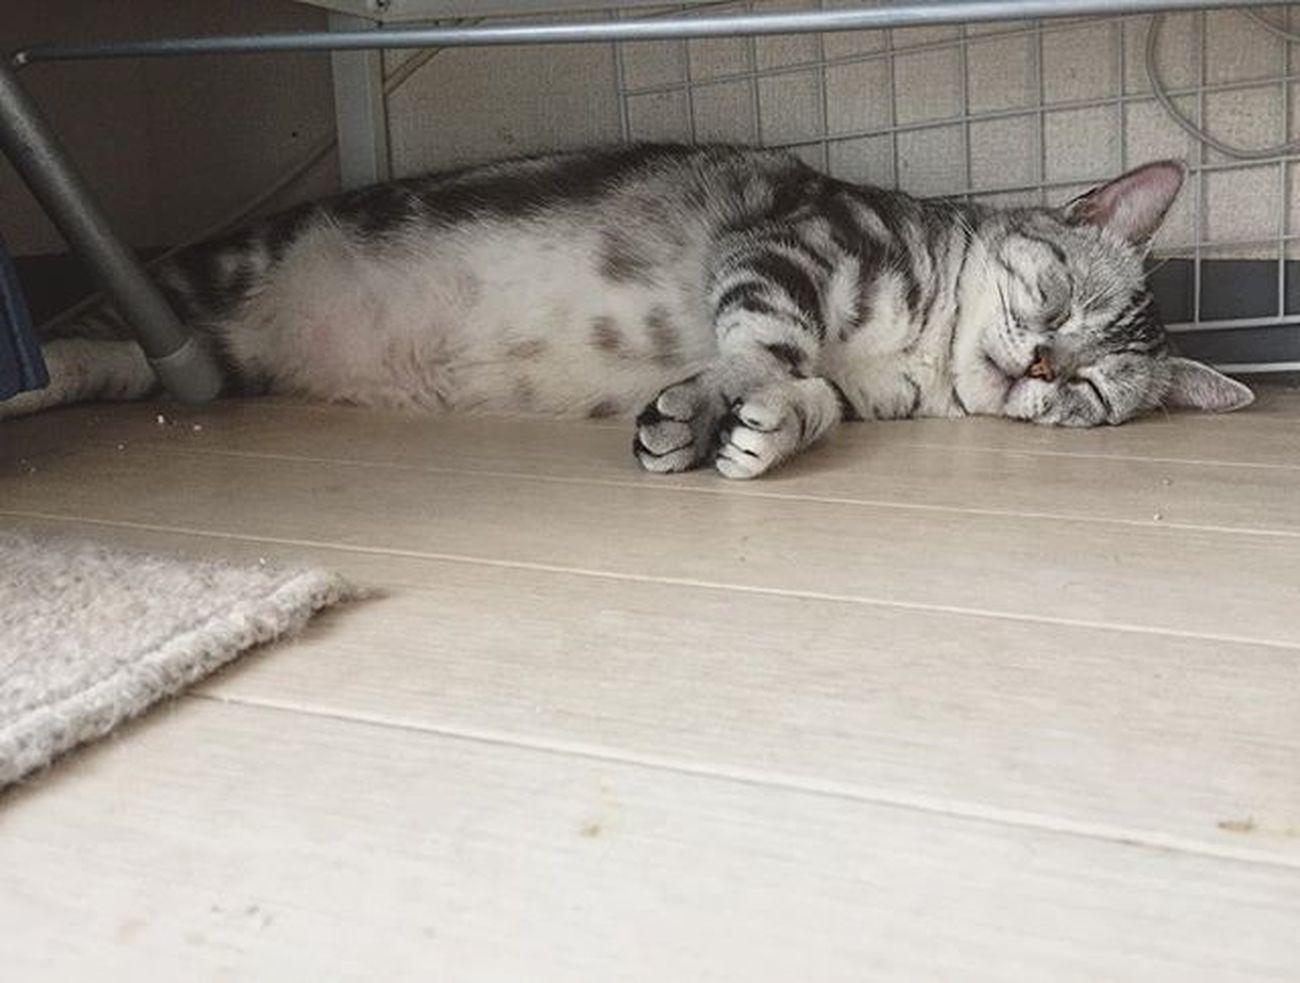 Cat Neko ねこ 猫 ねこ Cats アメリカンショートヘアー アメショ Americanshorthair ズズ ズズ子 Zuzu ズズっぺ シルバータビー 棚の下のズズ〜😆😸ズっぺ暑がりだからここが涼しいんだにゃ〜💕